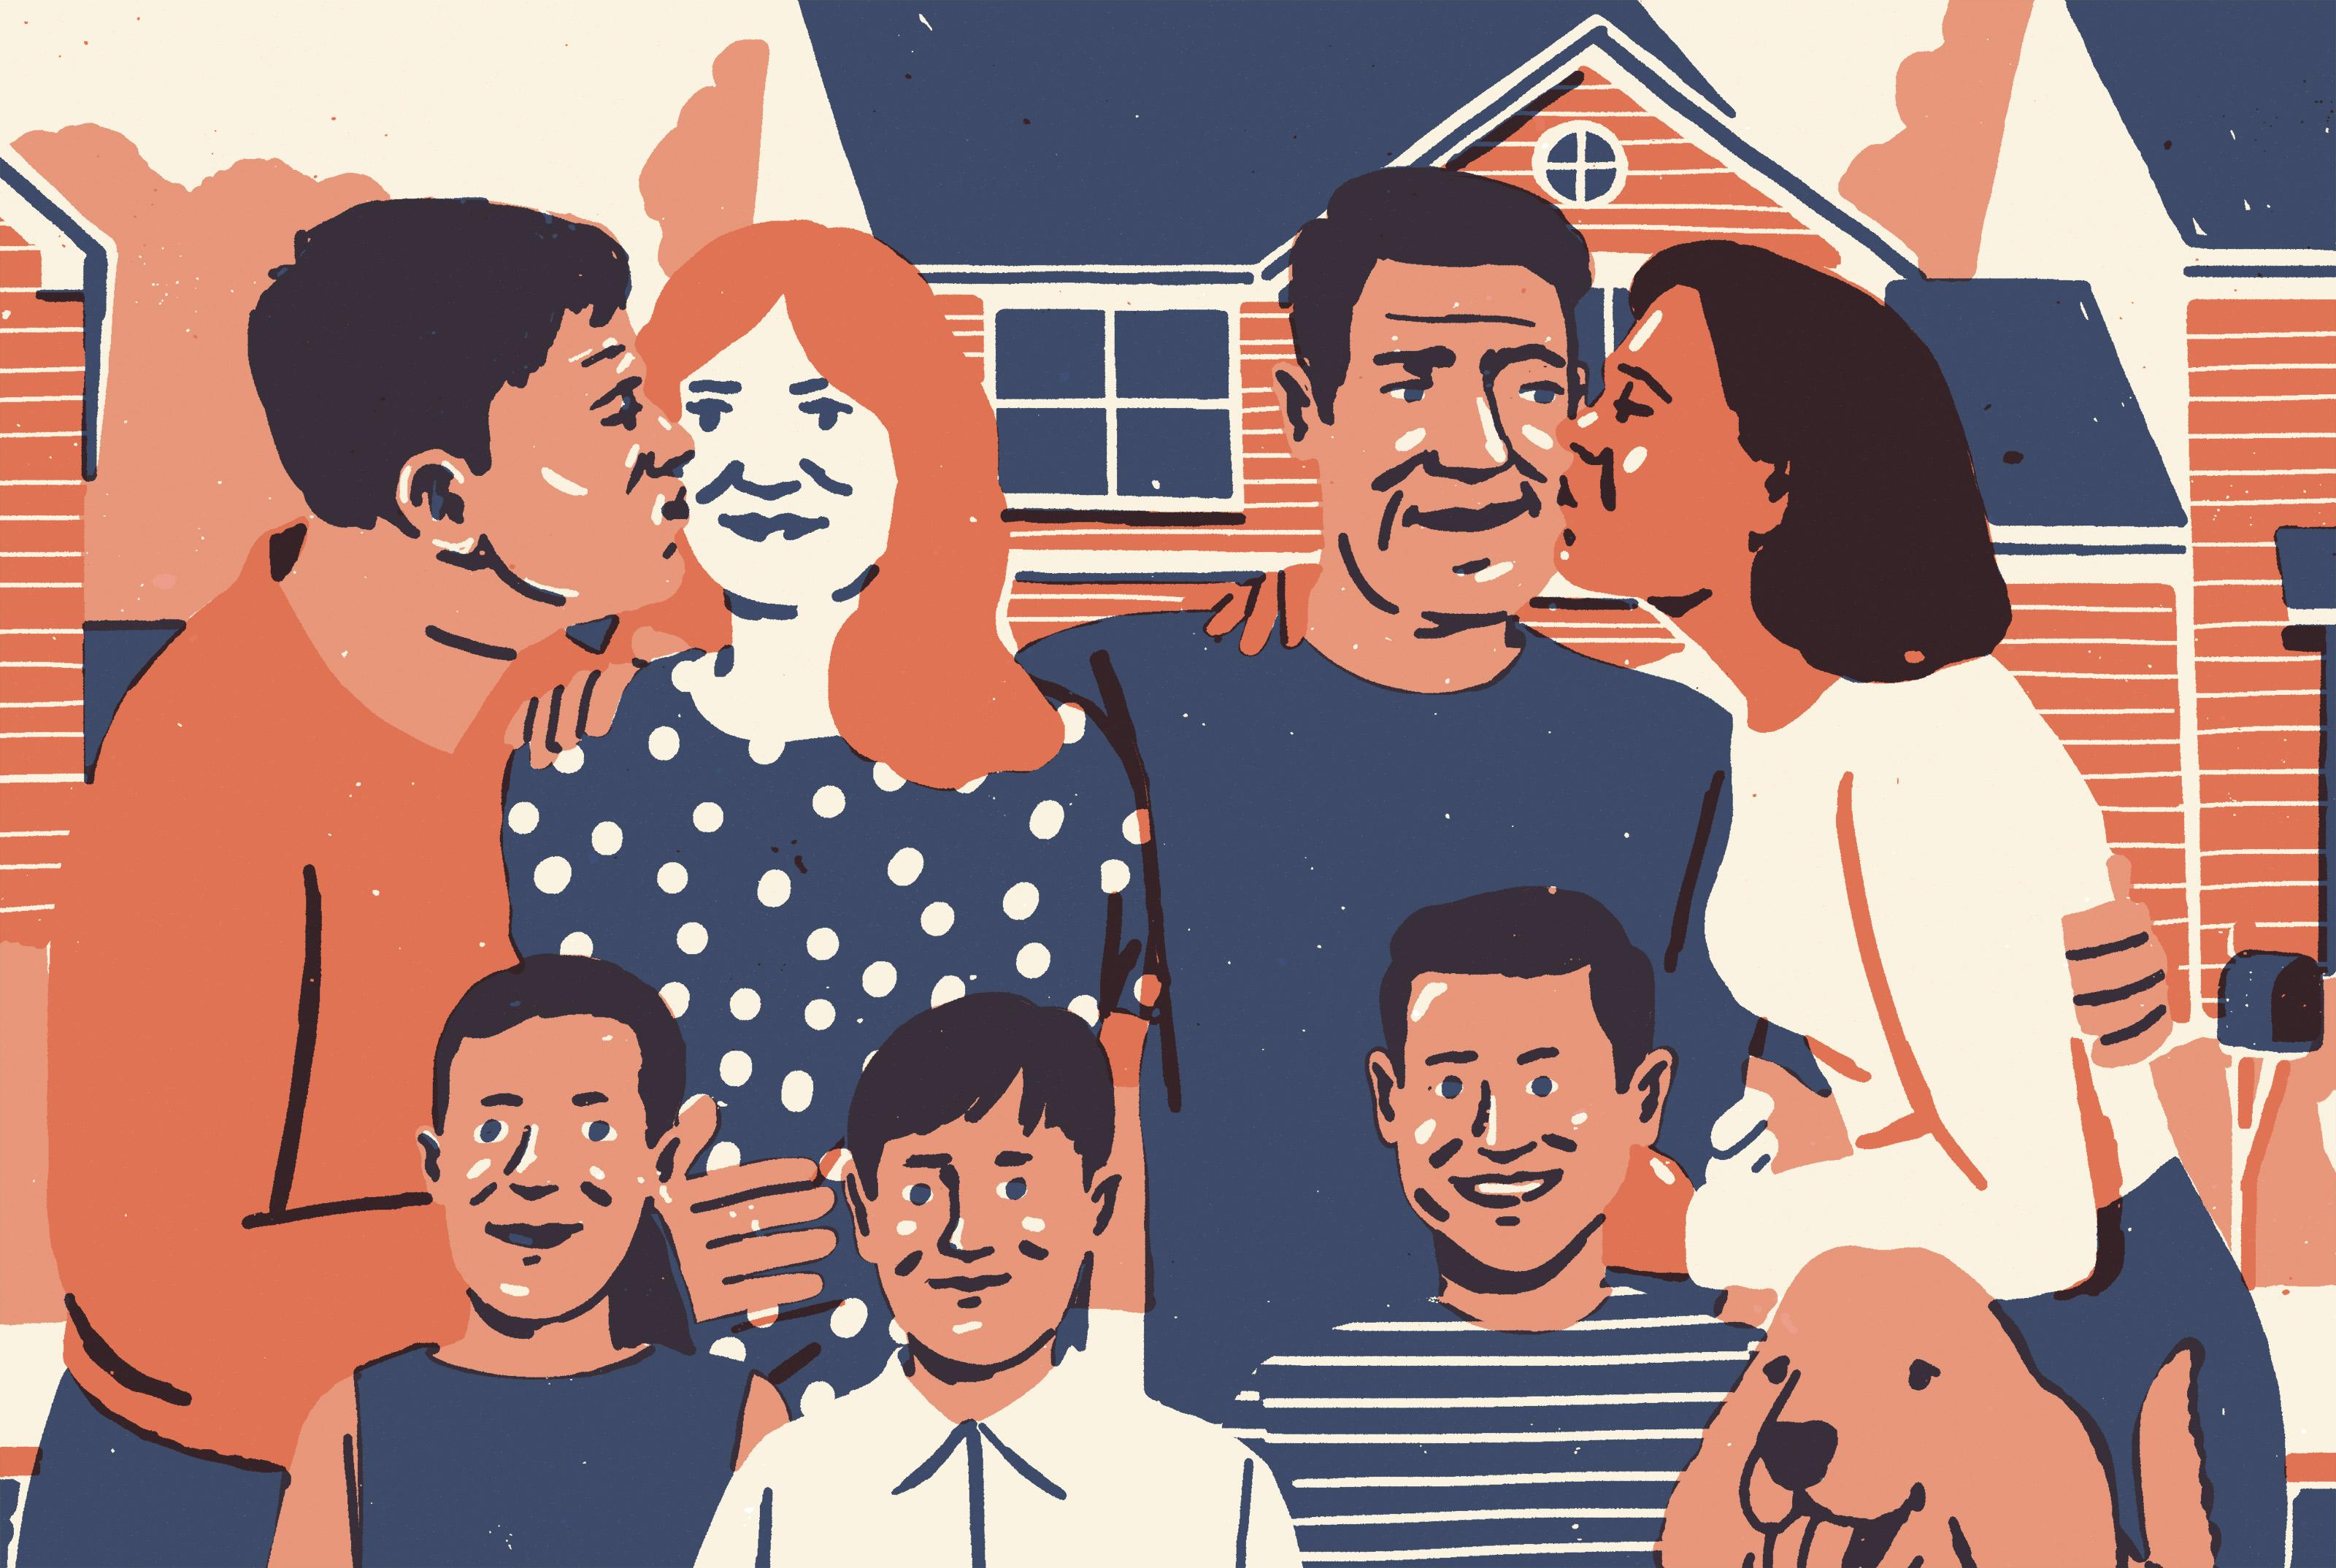 polyamorous family in 2018